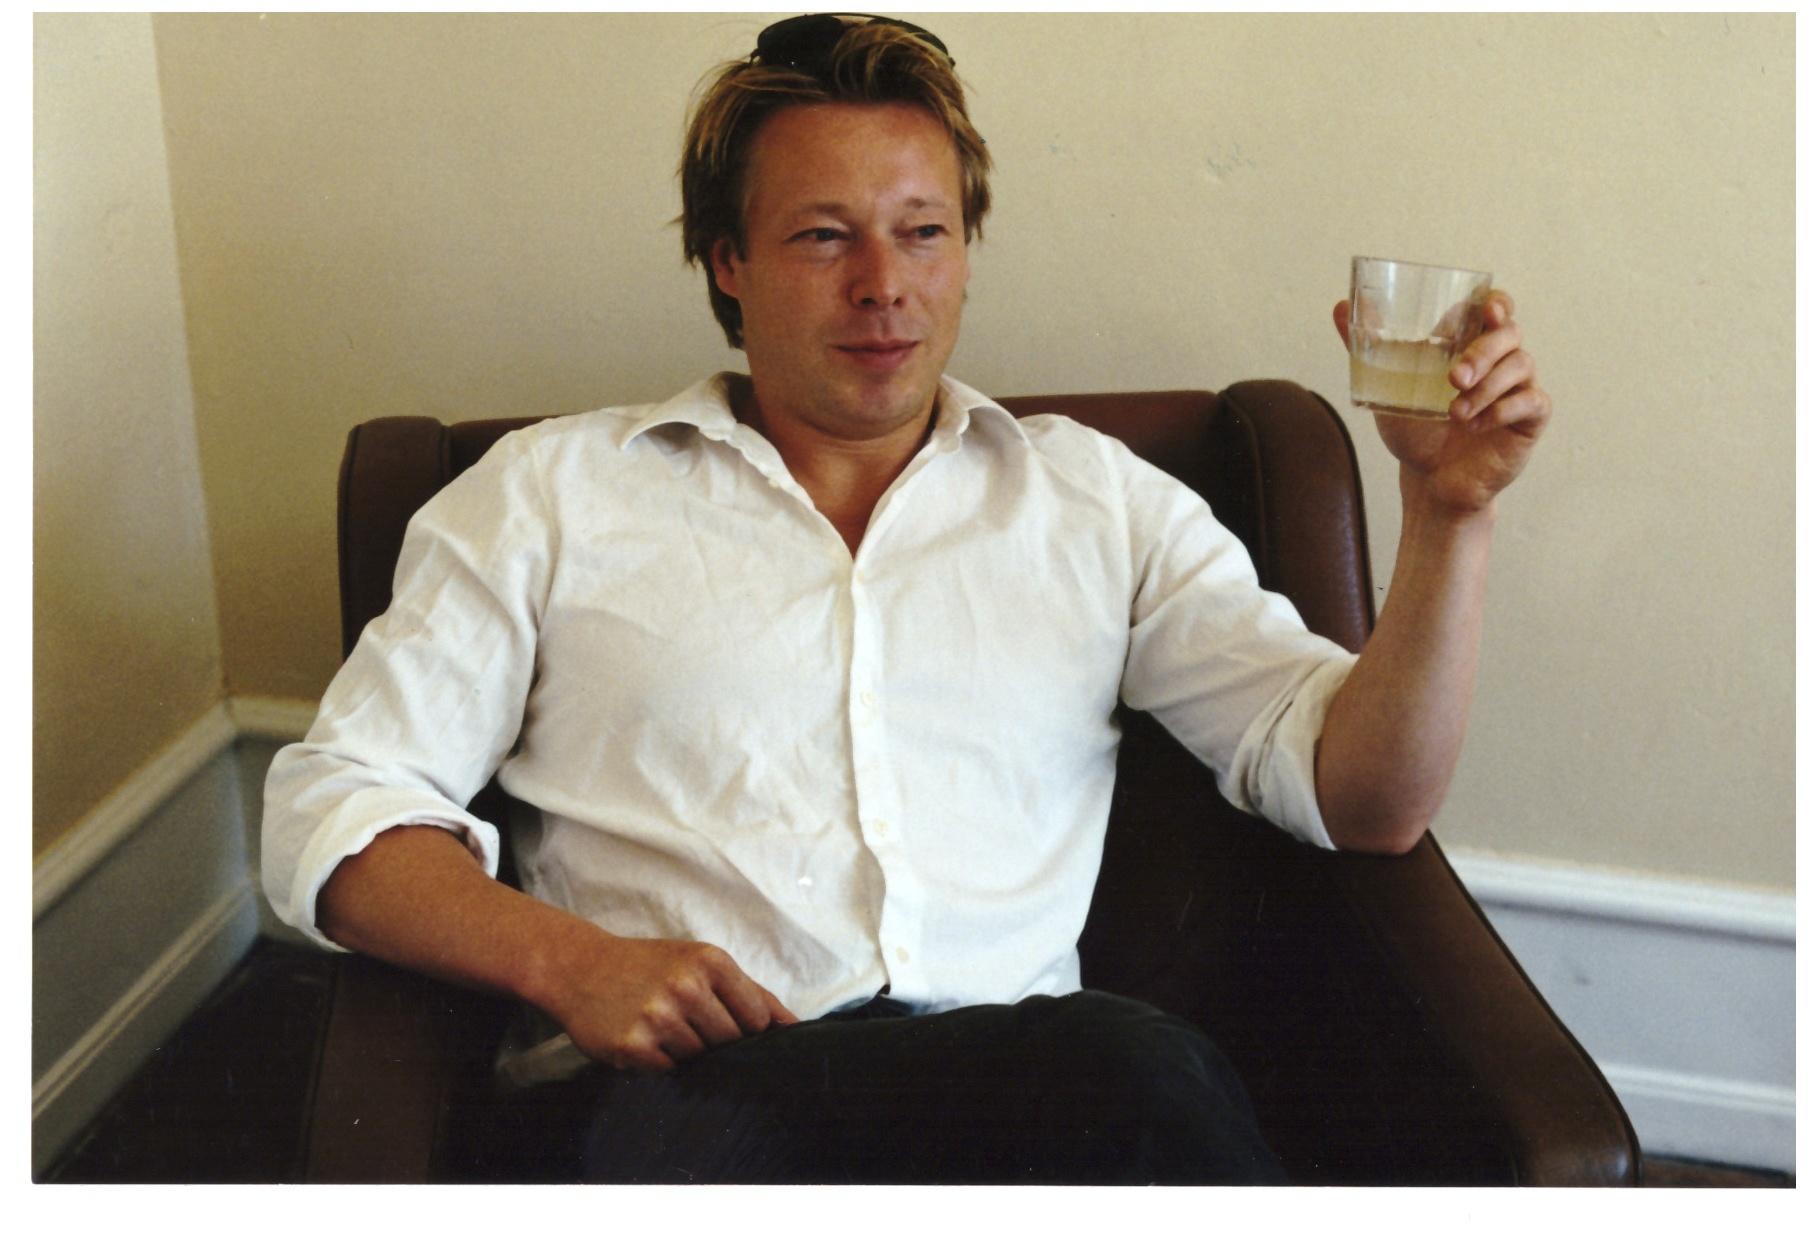 Staffan Boije af Gennäs 1999